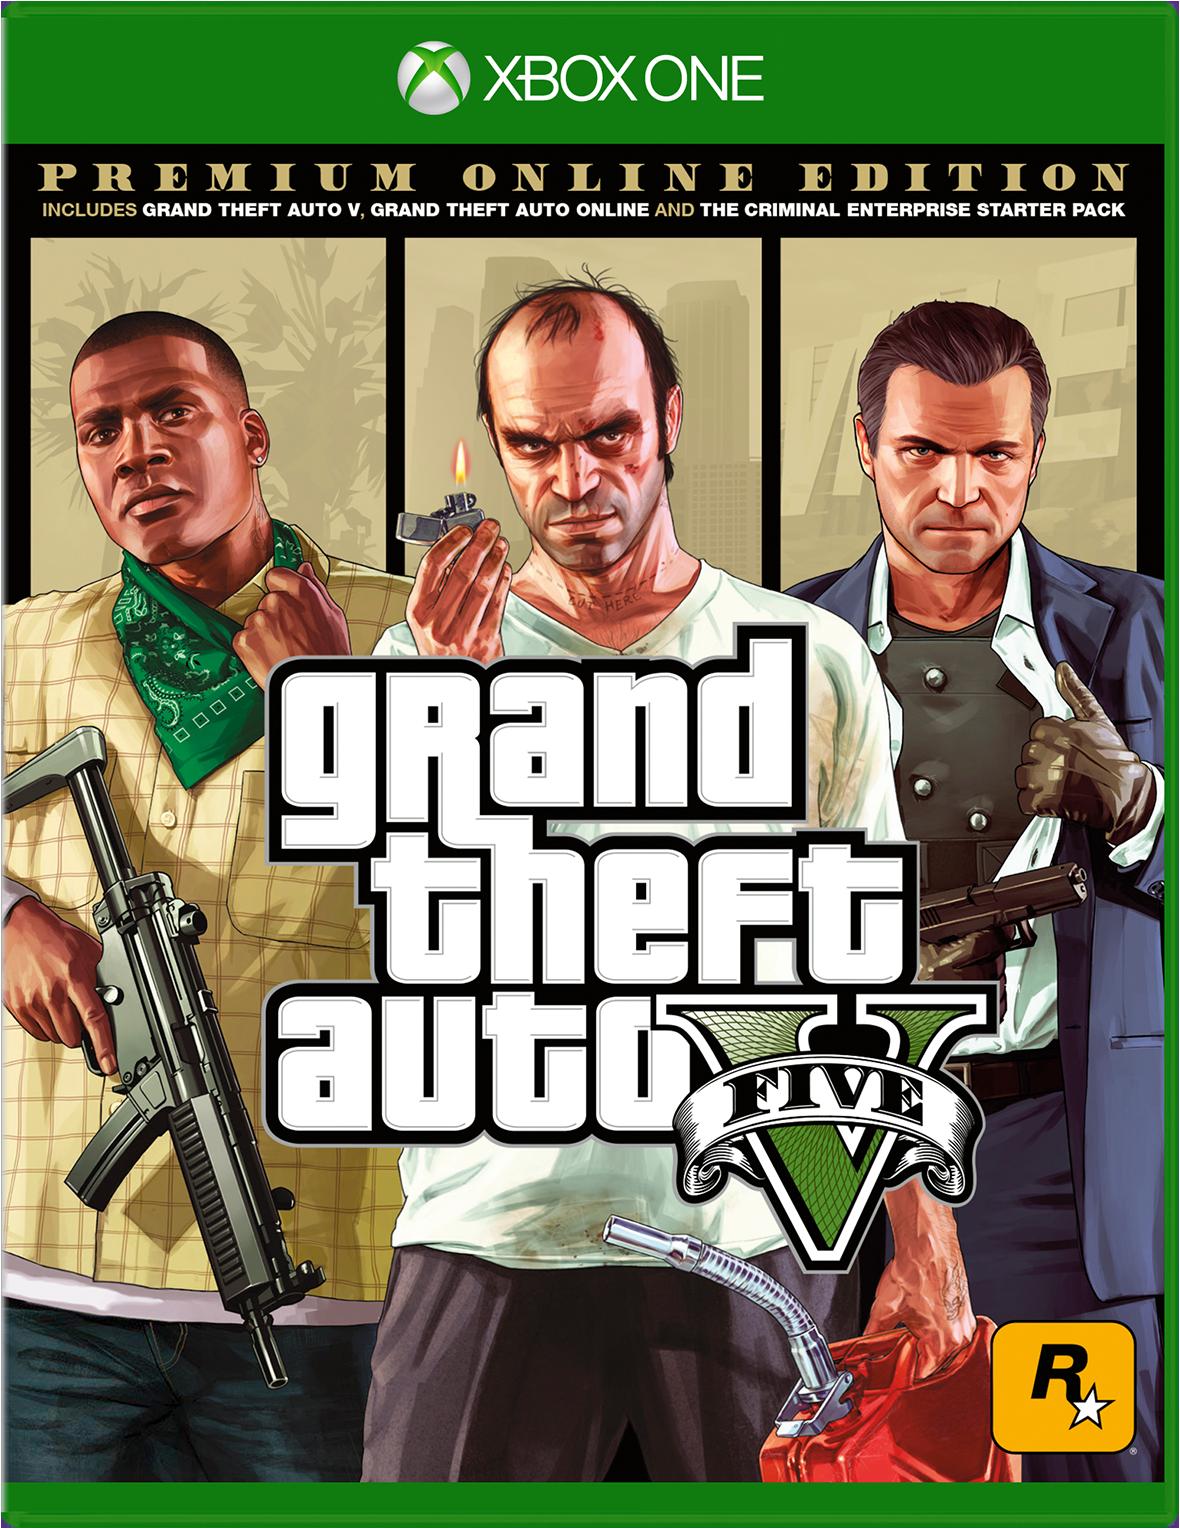 Cover of Grand Theft Auto 5 Premium Online Edition